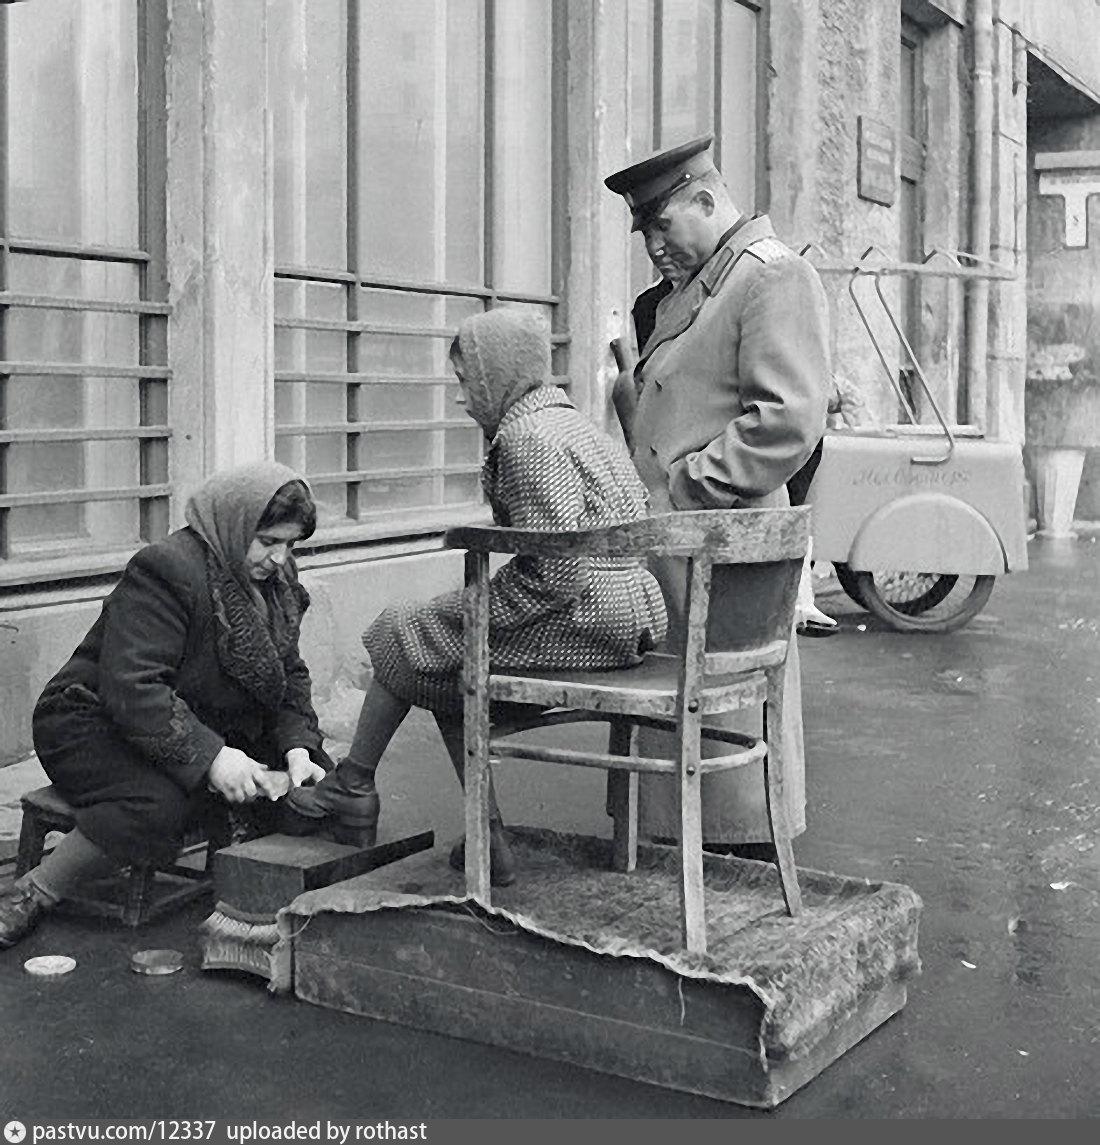 чистка обуви в ссср фото влияние церкви